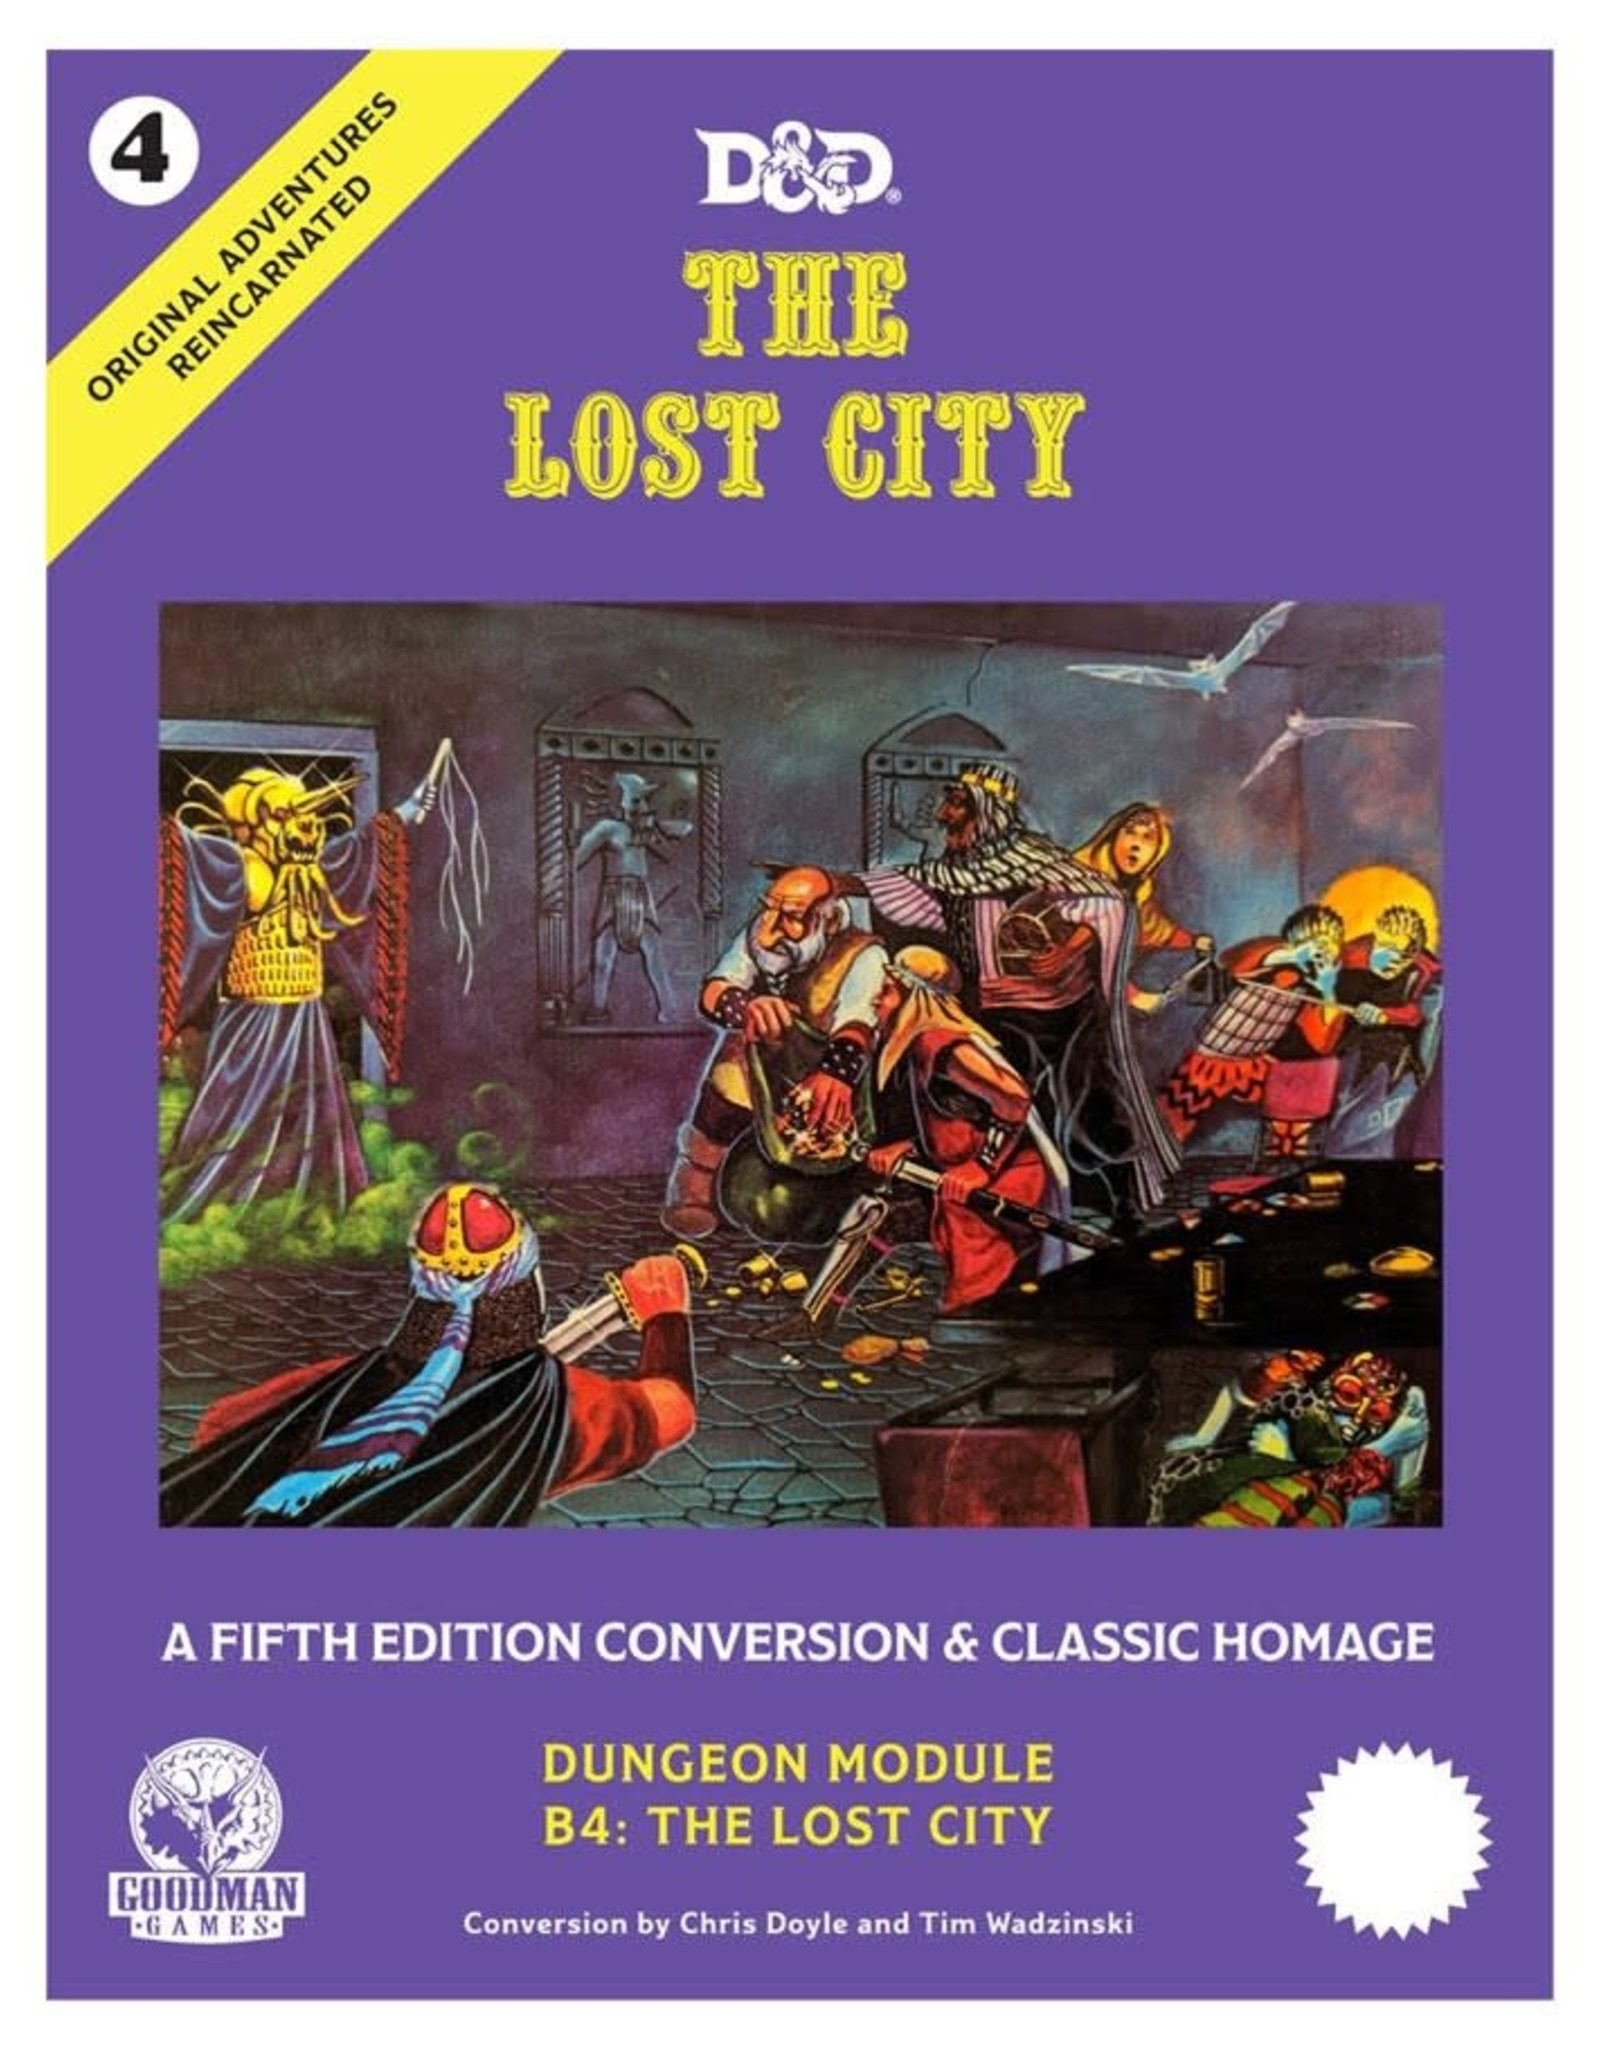 Goodman Games 5e Original Adventures: #4 The Lost City